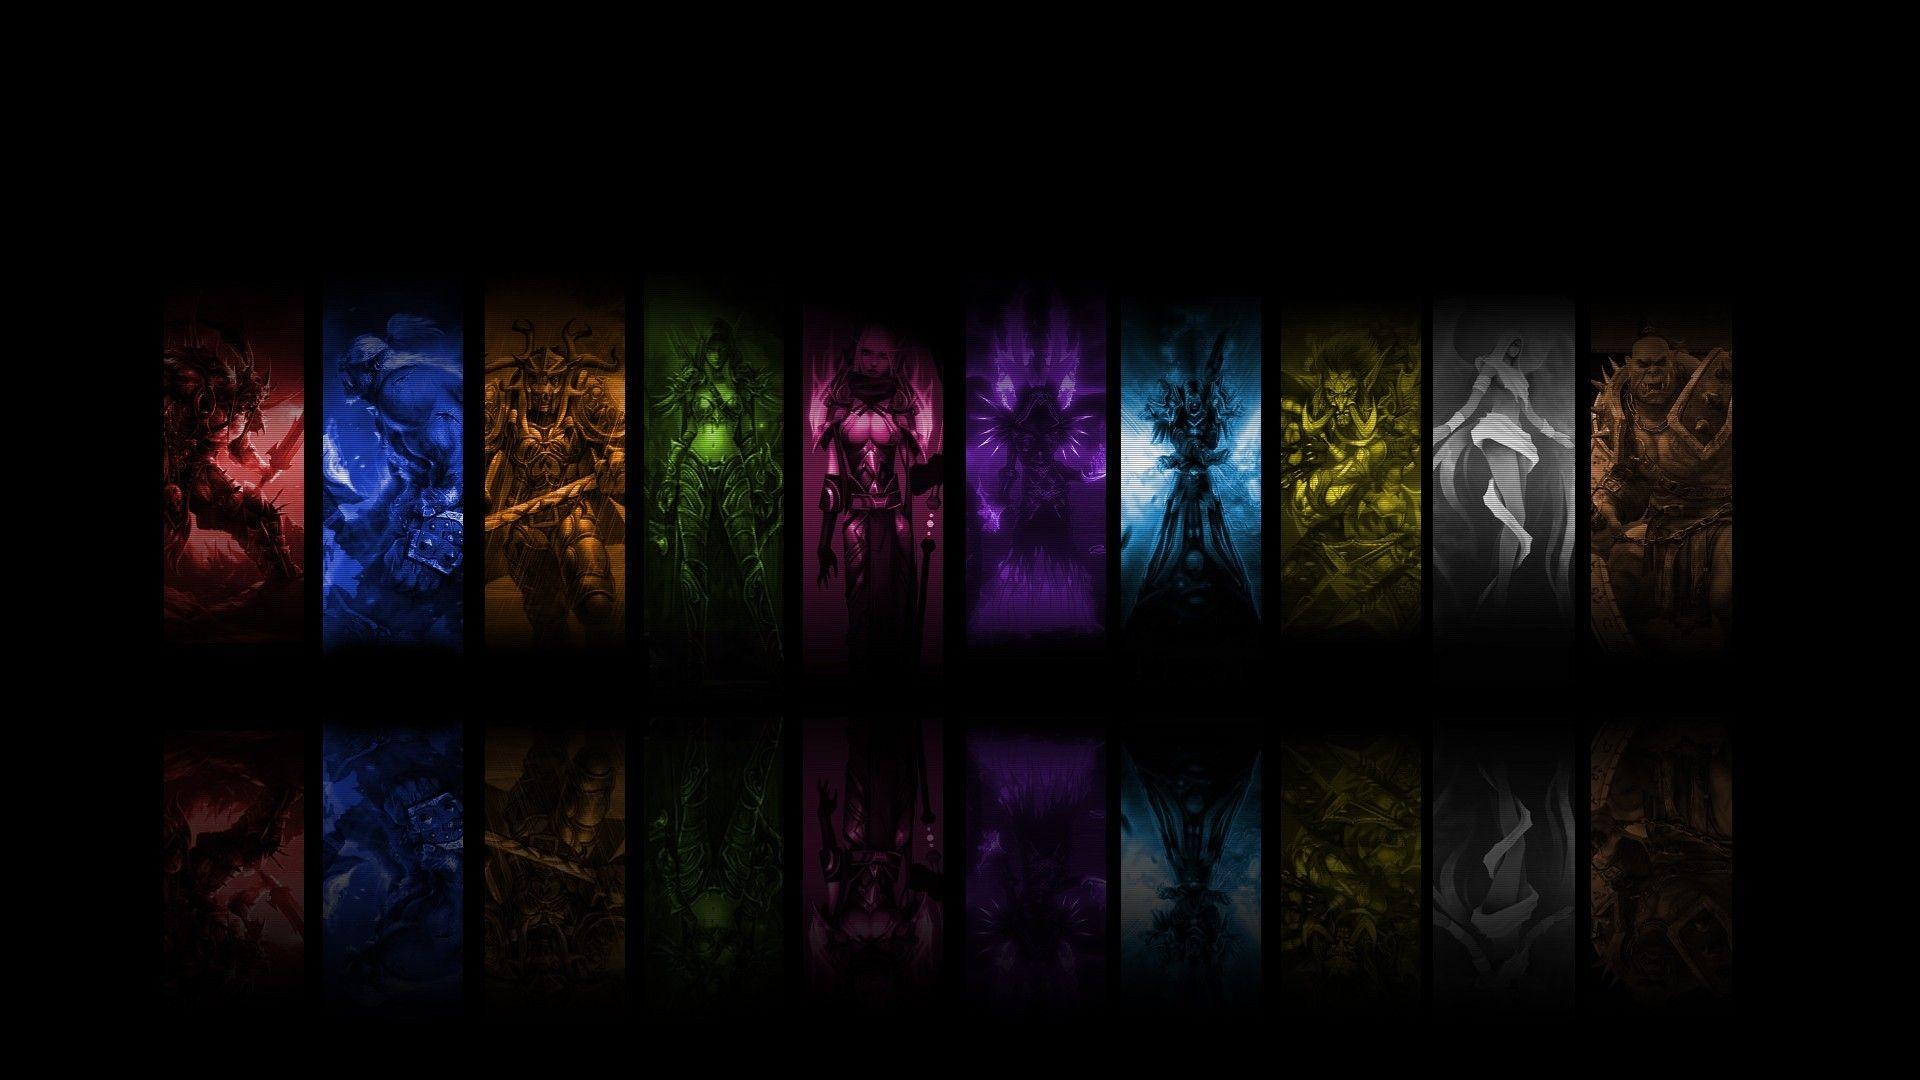 72 Wow Alliance Wallpapers On Wallpaperplay Digital Wallpaper World Of Warcraft Wallpaper Phone Wallpaper